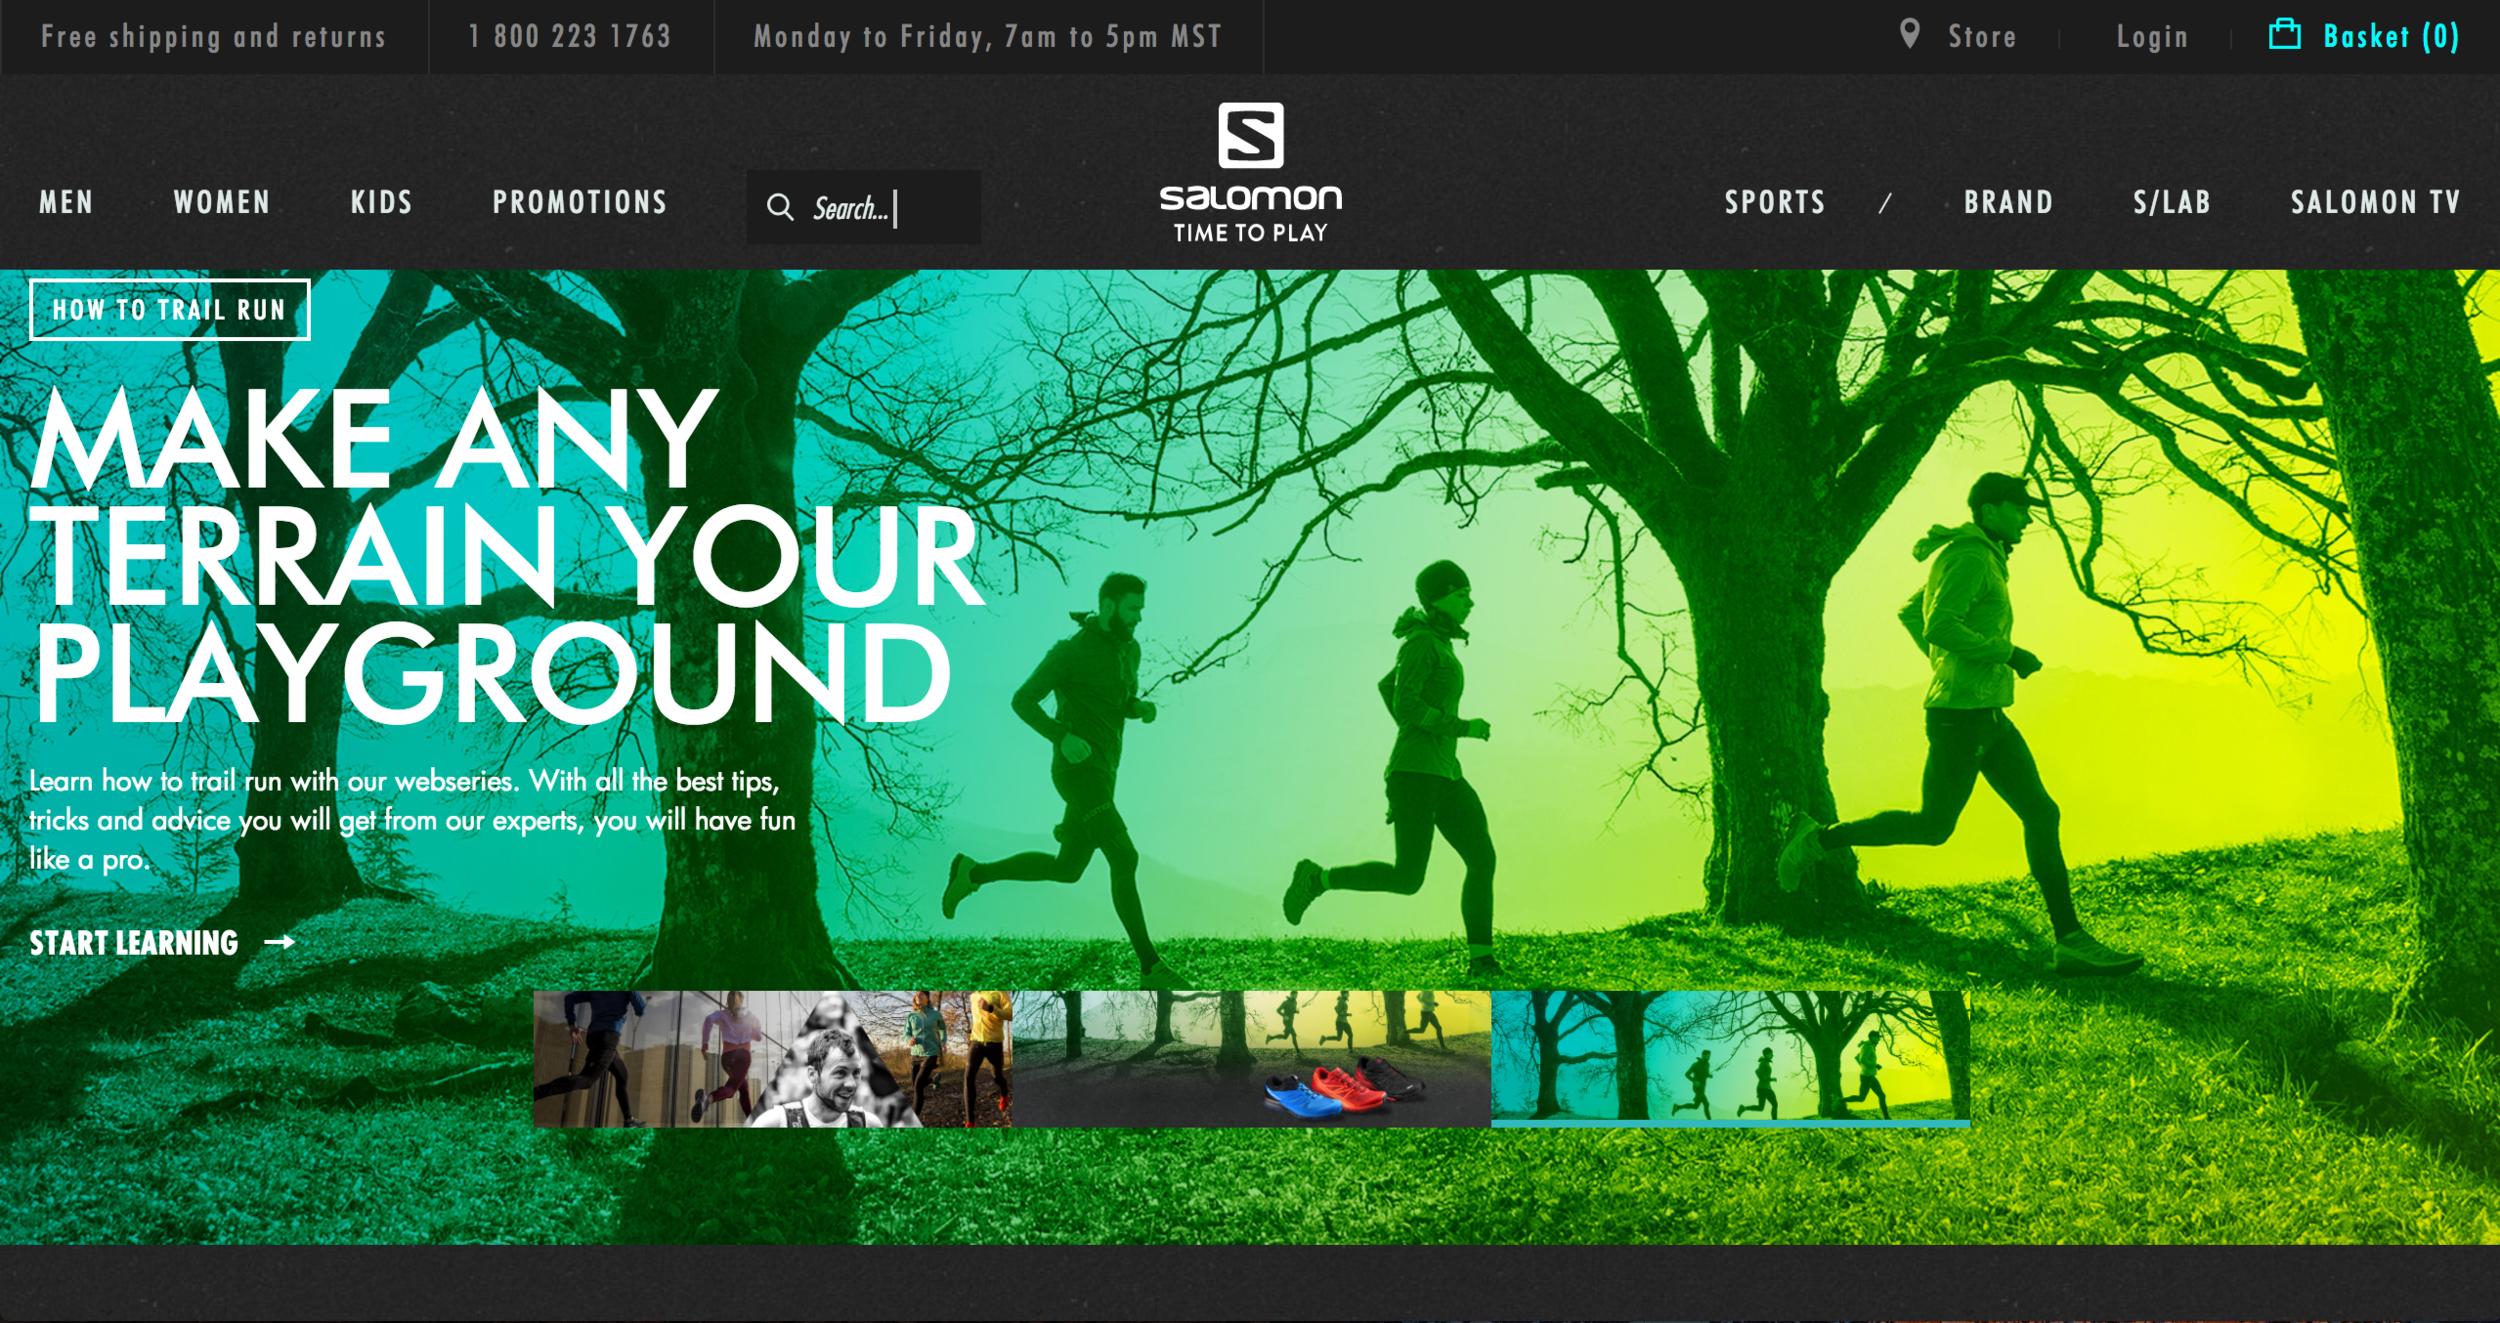 Salomon Web — creative direction meets copy